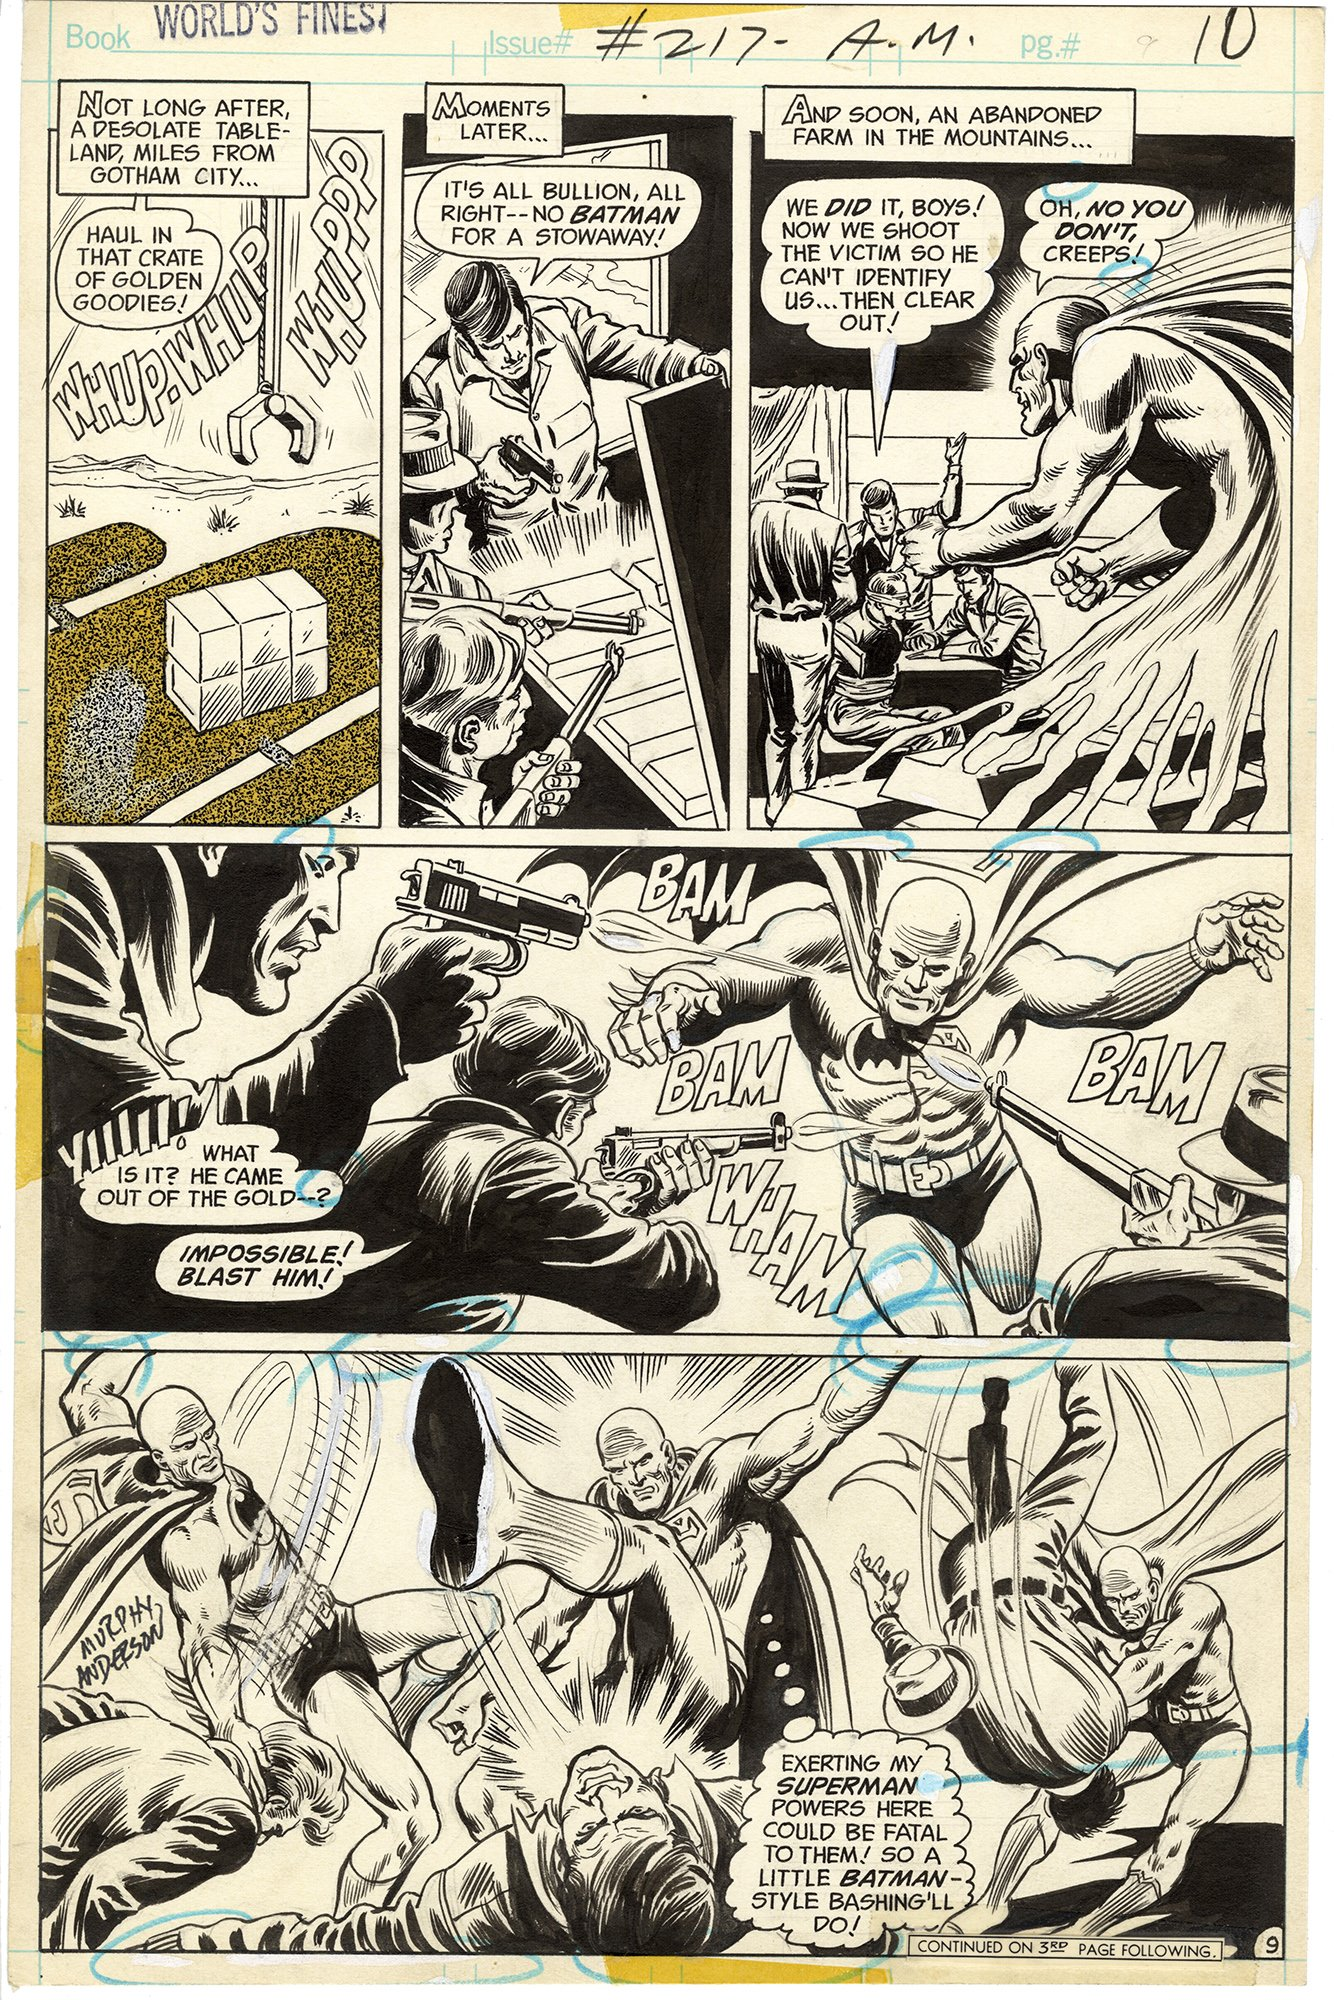 World's Finest Comics #217 p9